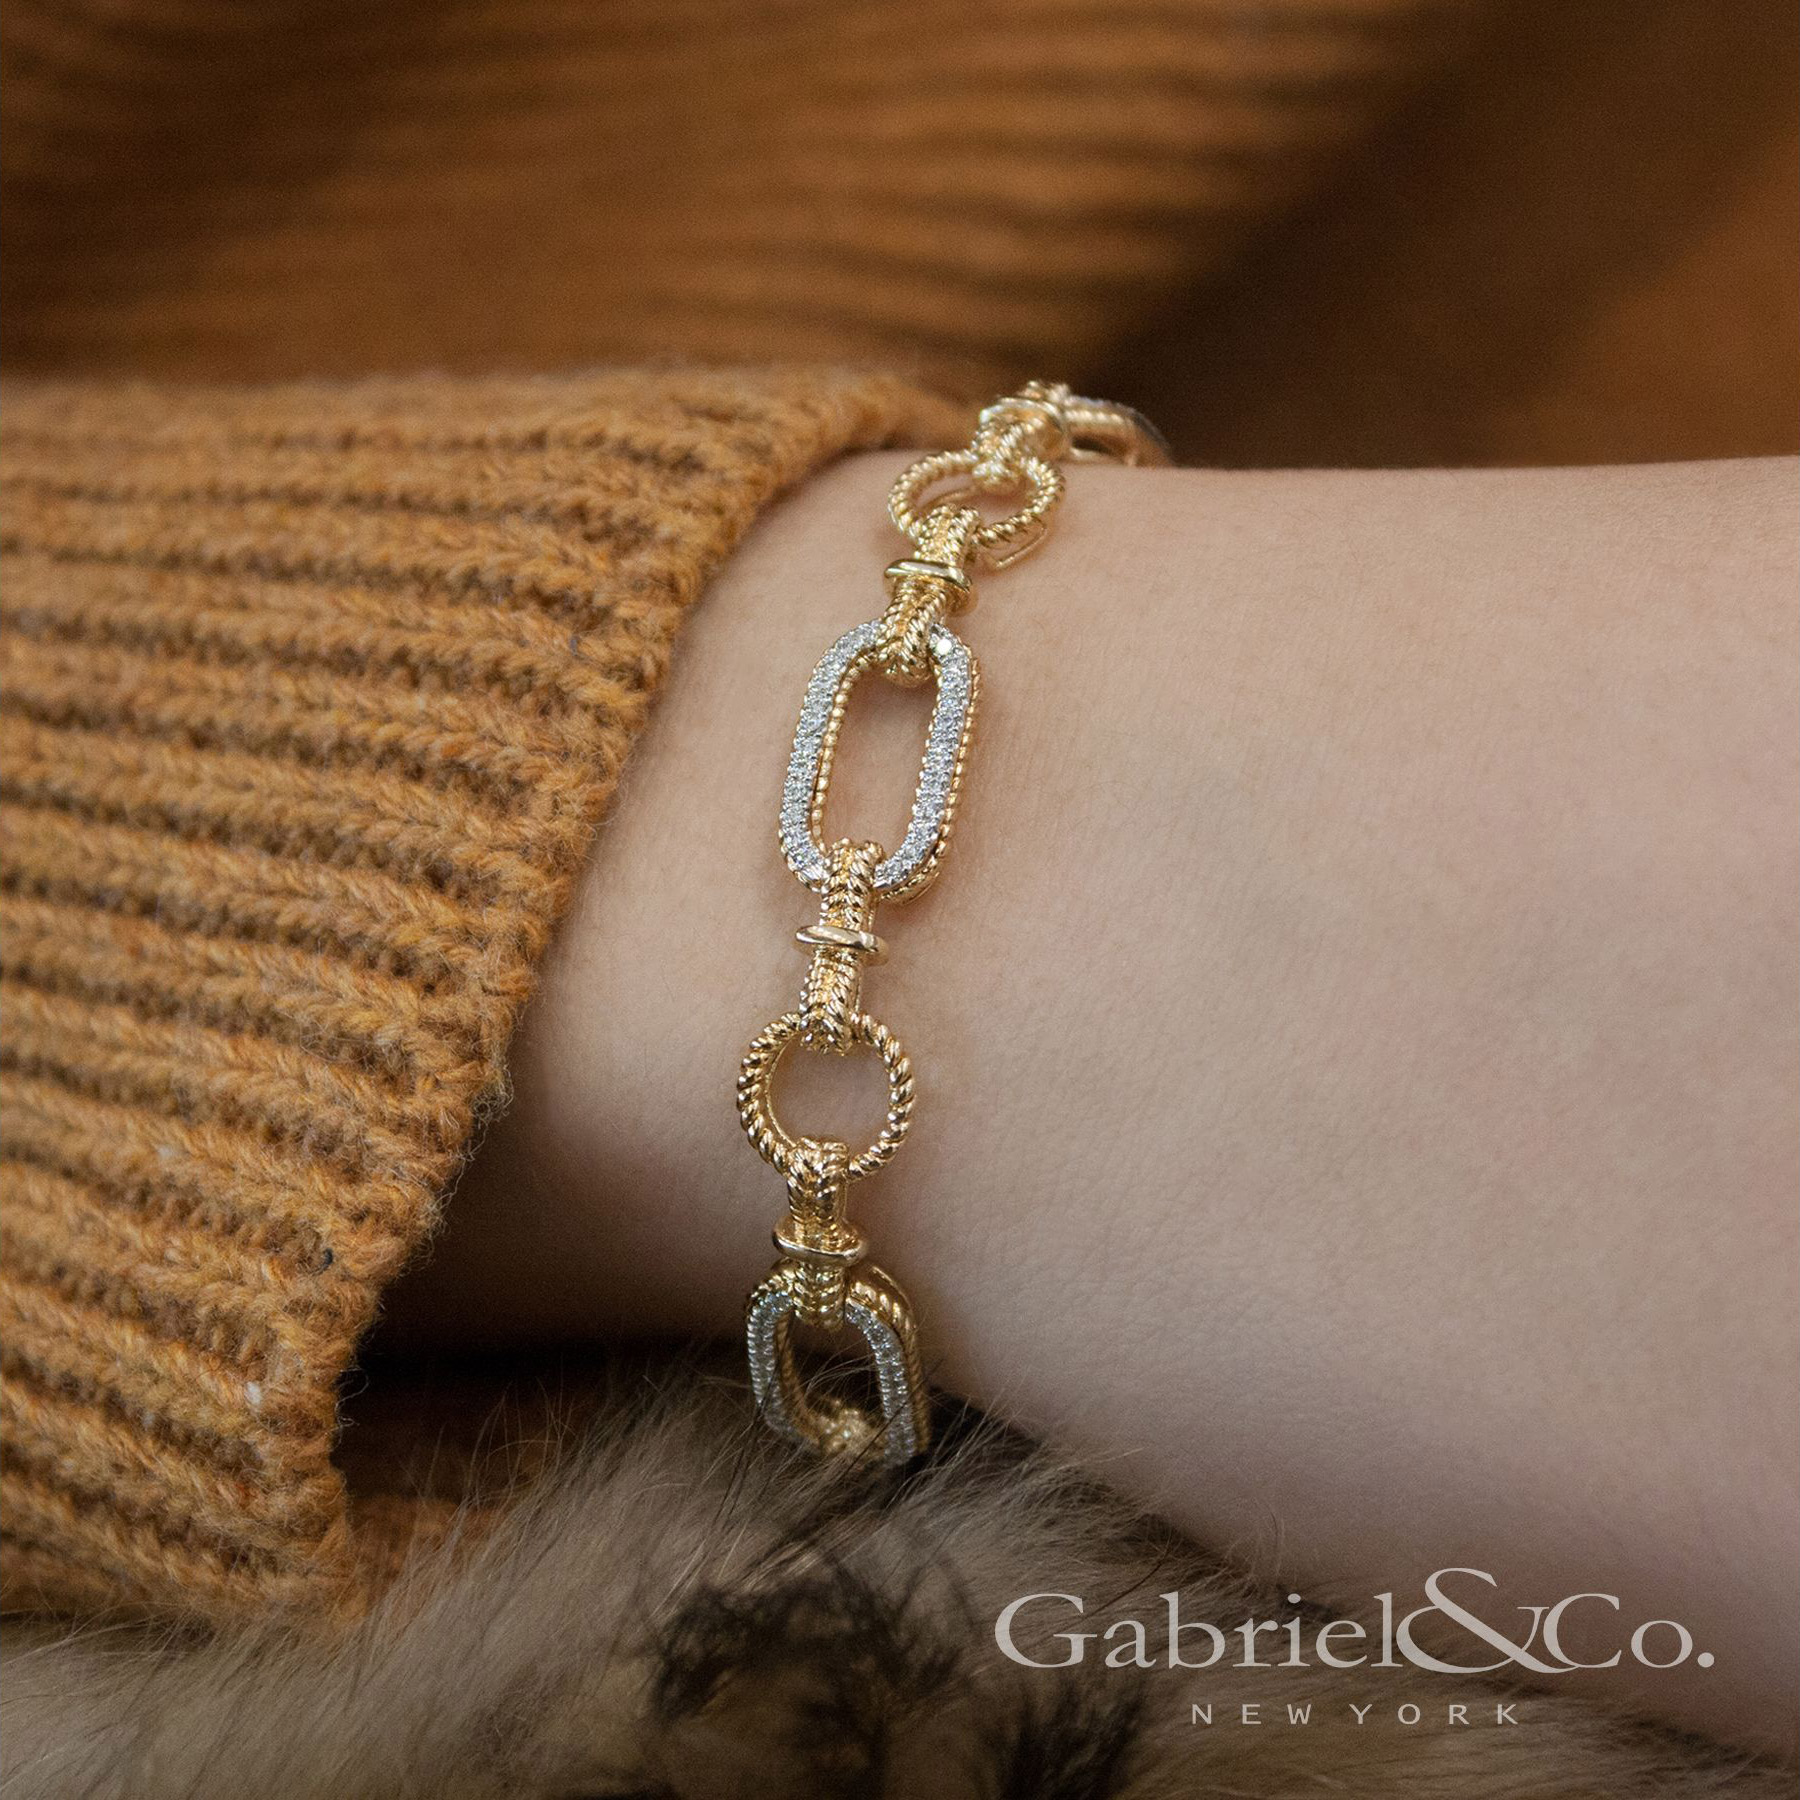 Wearing the Gabriel&Co Hampton Bracelet